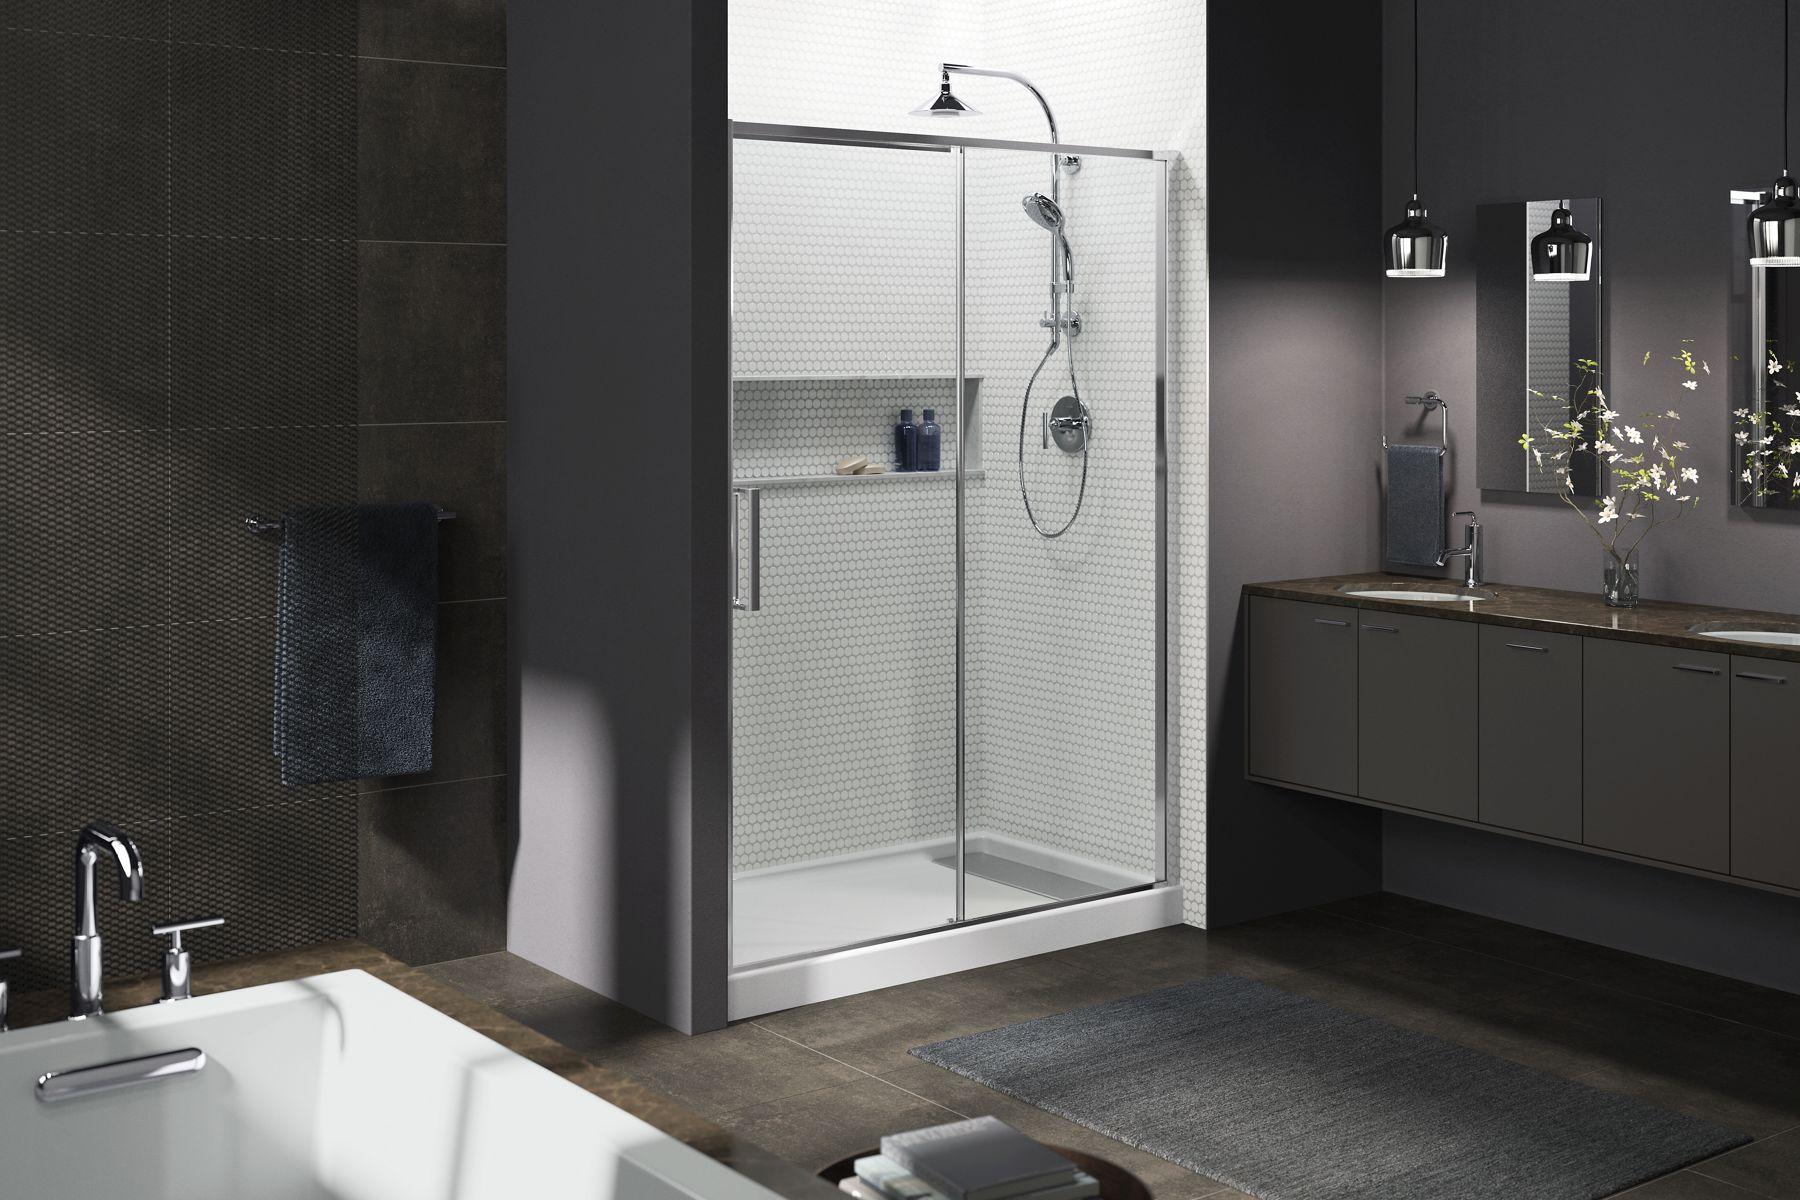 Torsion™ Shower Doors & Shower Doors | Showering |Bathroom | KOHLER